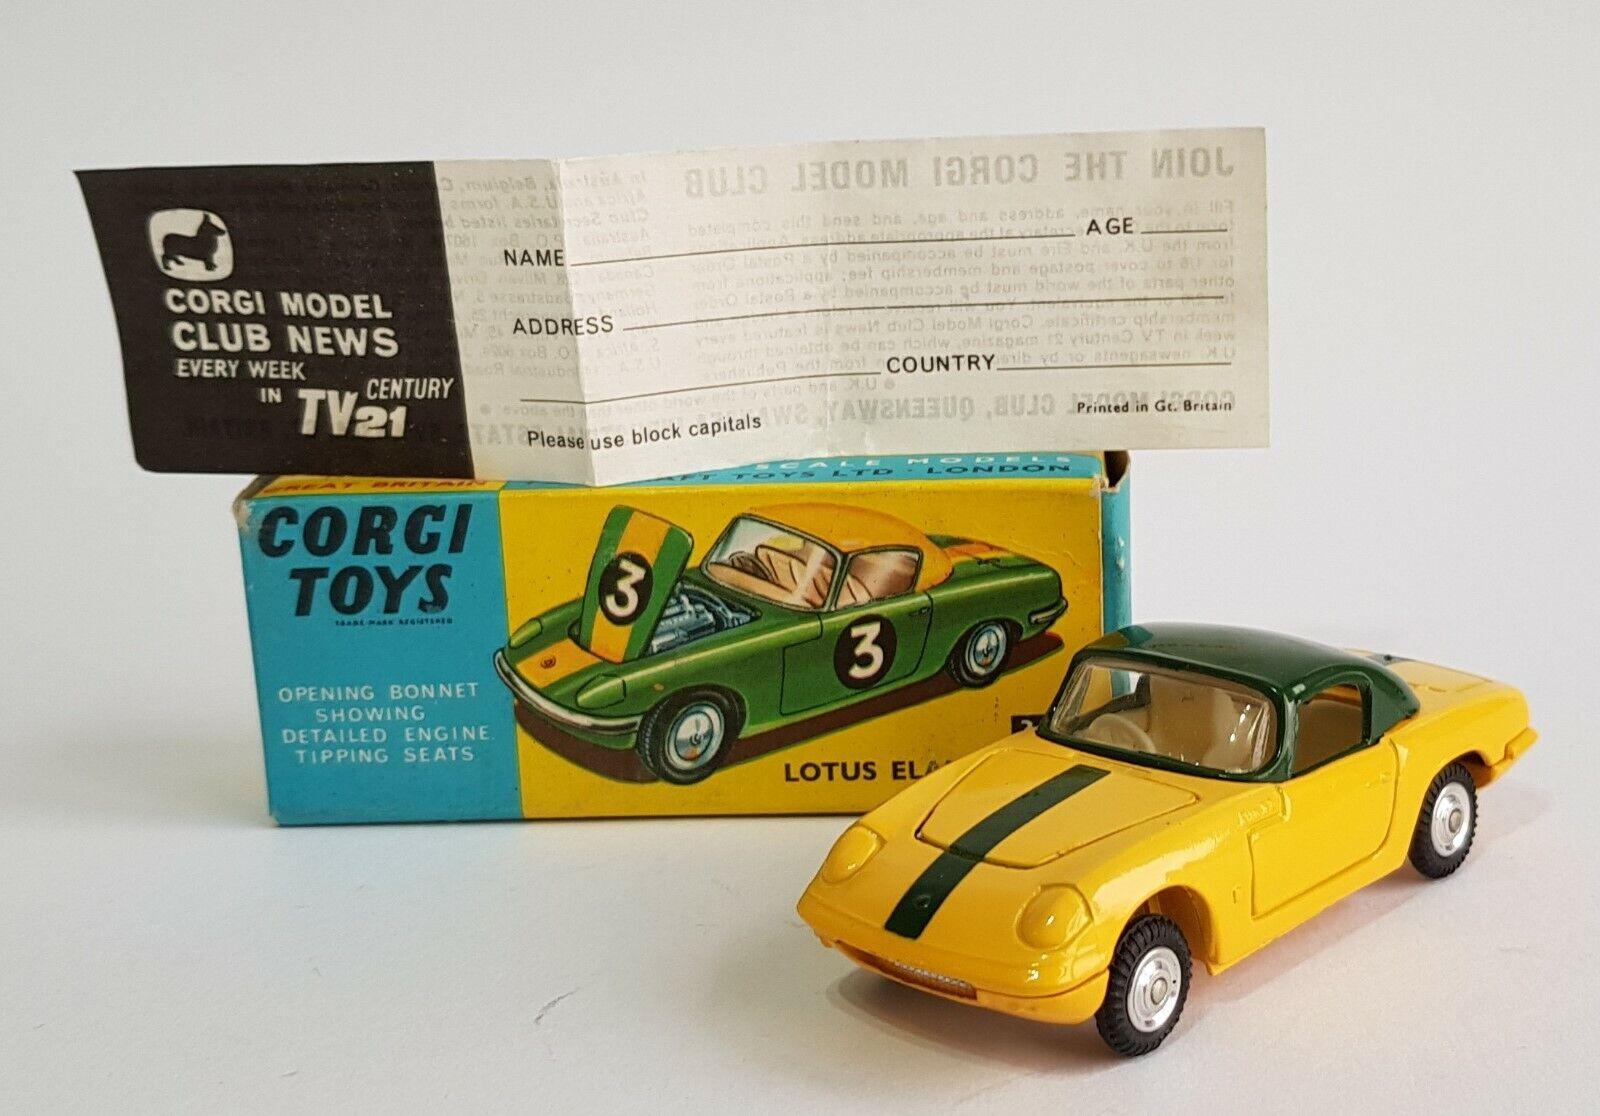 Sällsynta Corgi-leksaker nr 319, Lotus Elan Coupe, Safed Wklackar Variation, Superb Mint